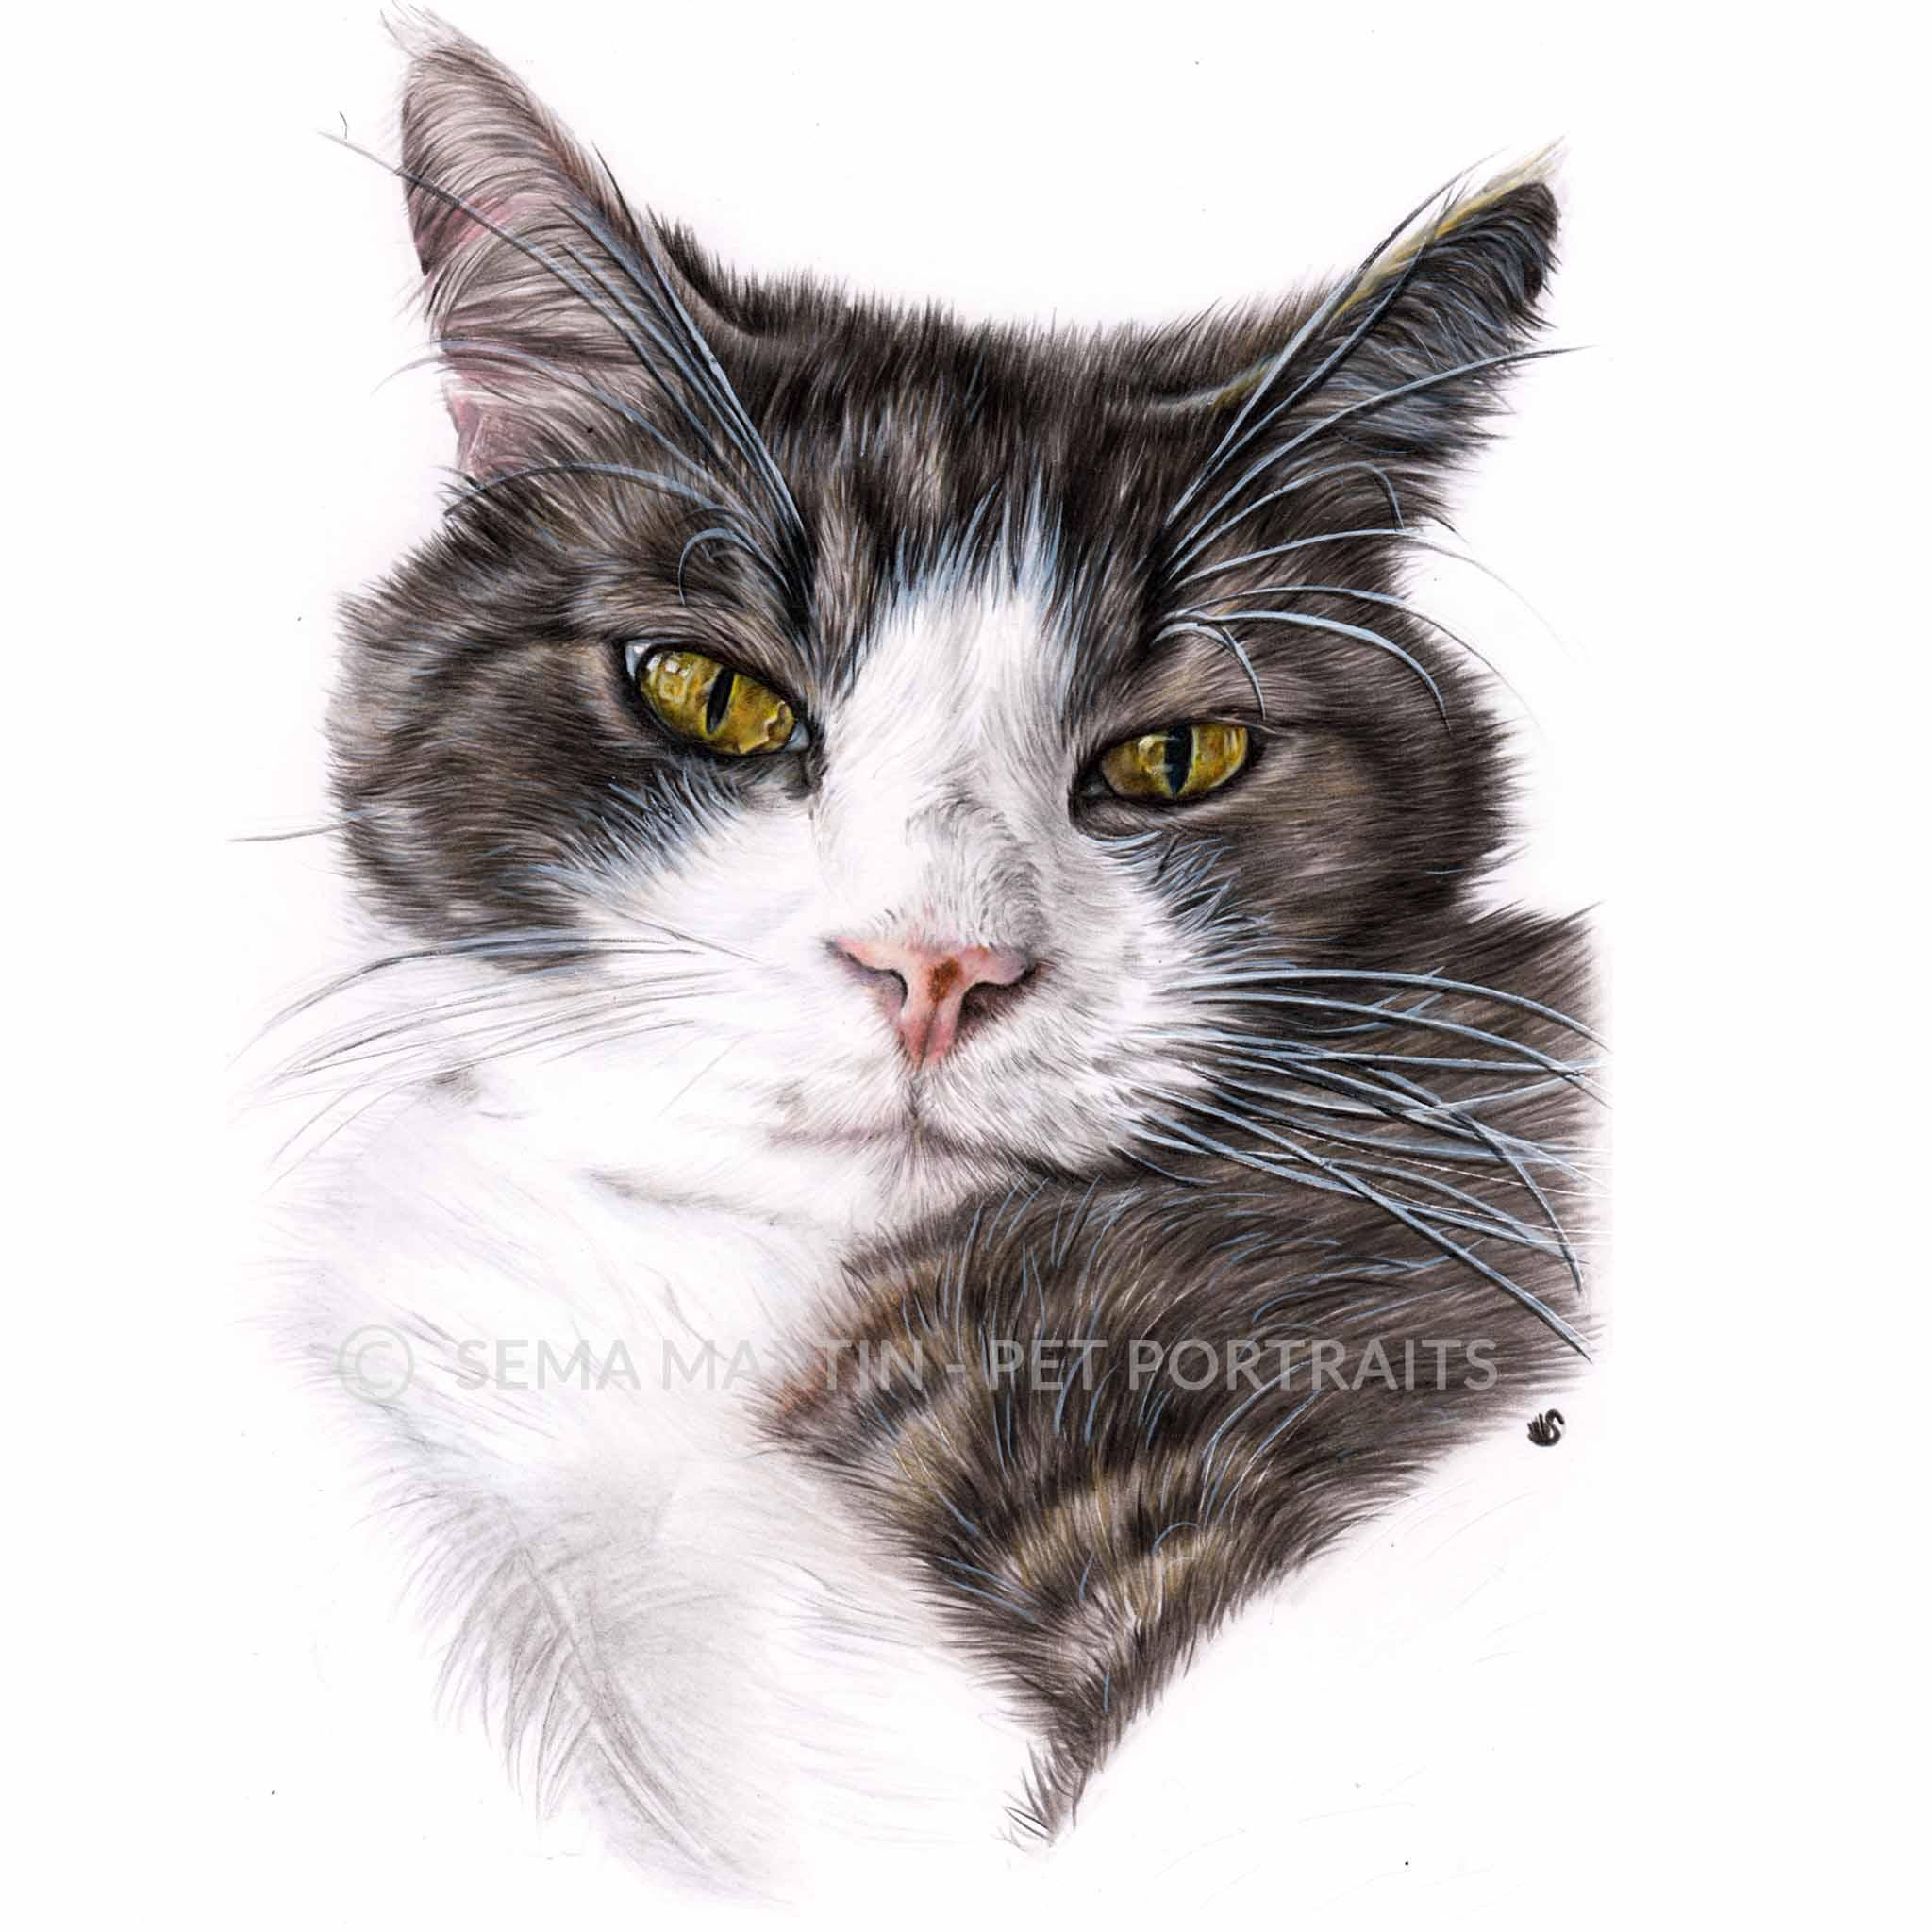 'Ollie' - Australia, 8.3 x 11.7 inches, 2018, colour pencil cat pet portrait by artist sema martin